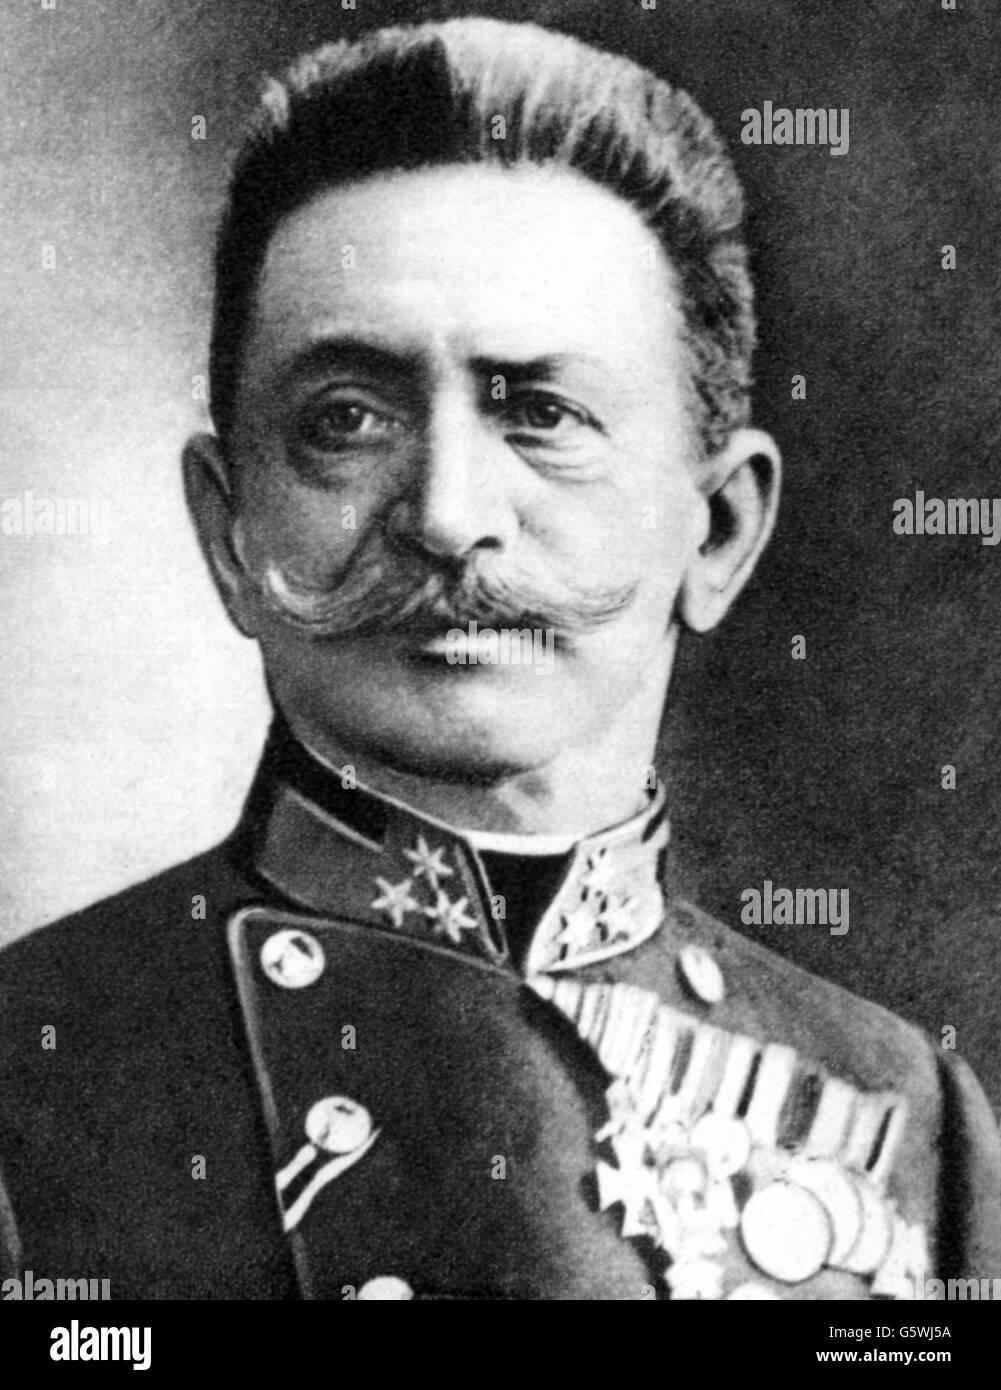 Conrad von Hoetzendorf, Franz, 11.11.1852 - 25.8.1925, Austrian general, chief of staff of the Austro-Hungarian Stock Photo